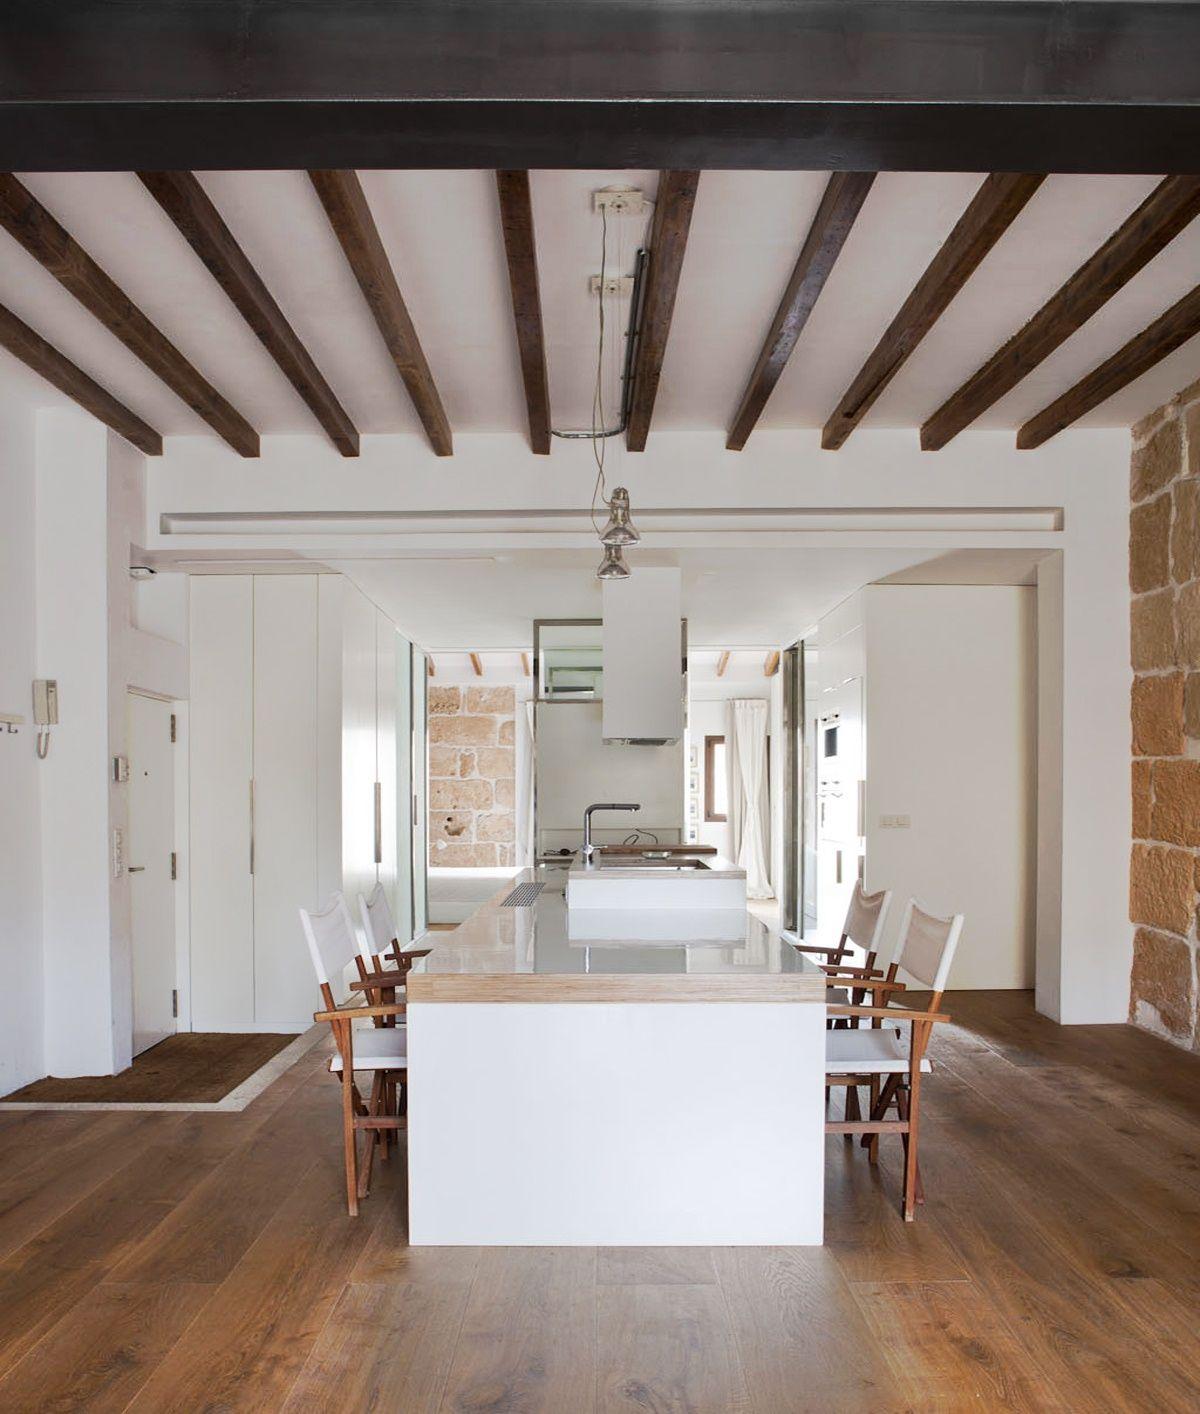 Reforma interior de cotacero taller de arquitectura en el Diseno de interiores palma de mallorca